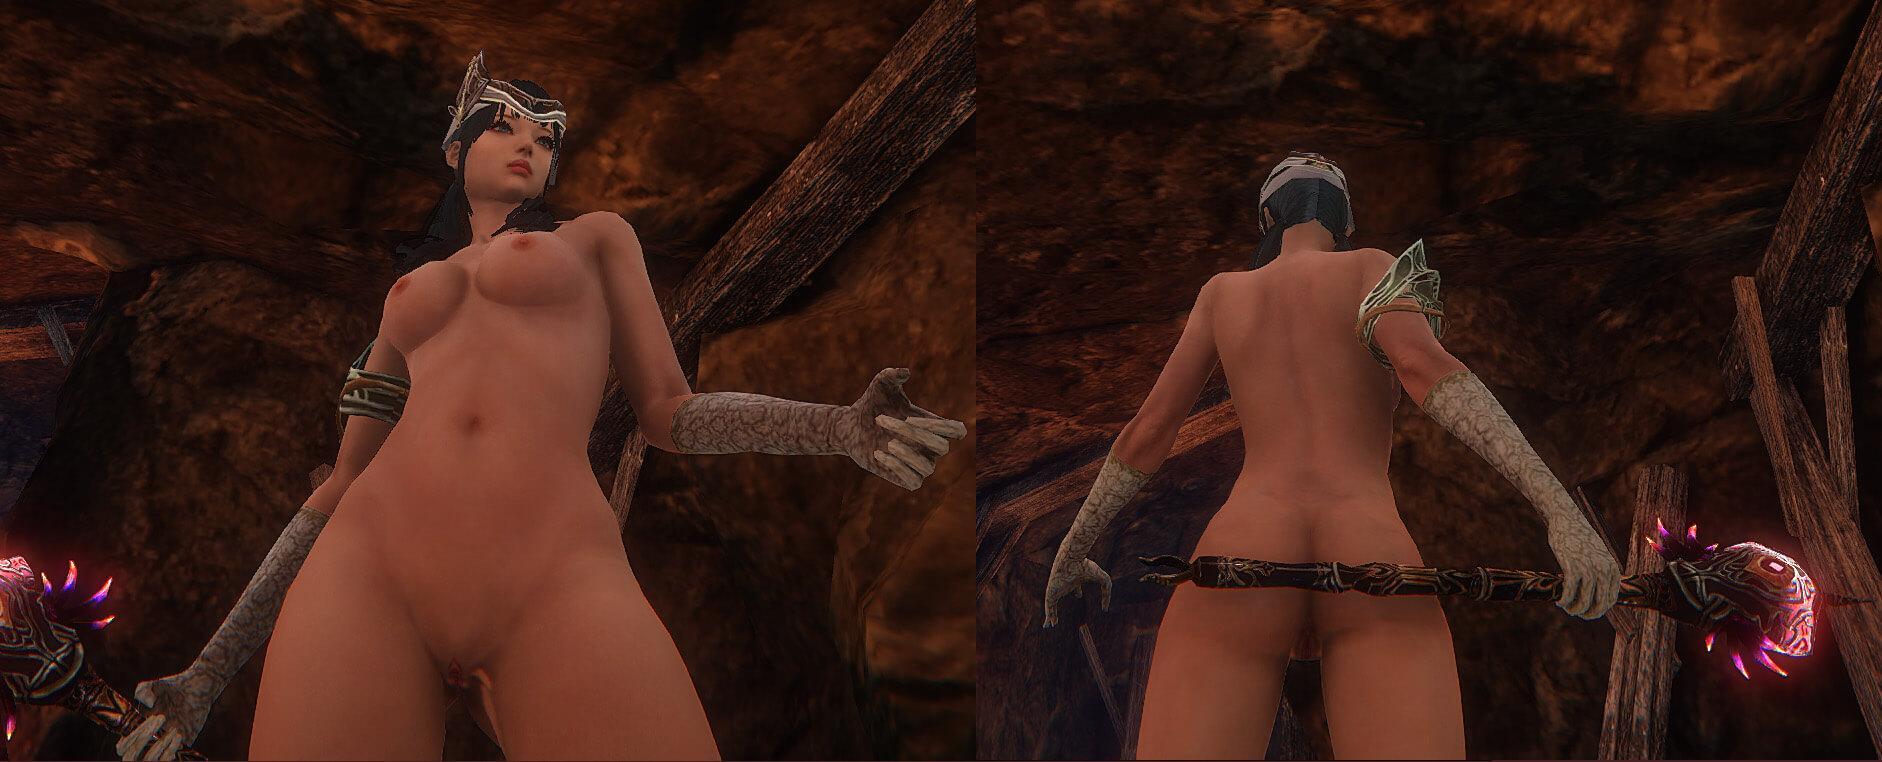 The players club nude, homos is satin panties